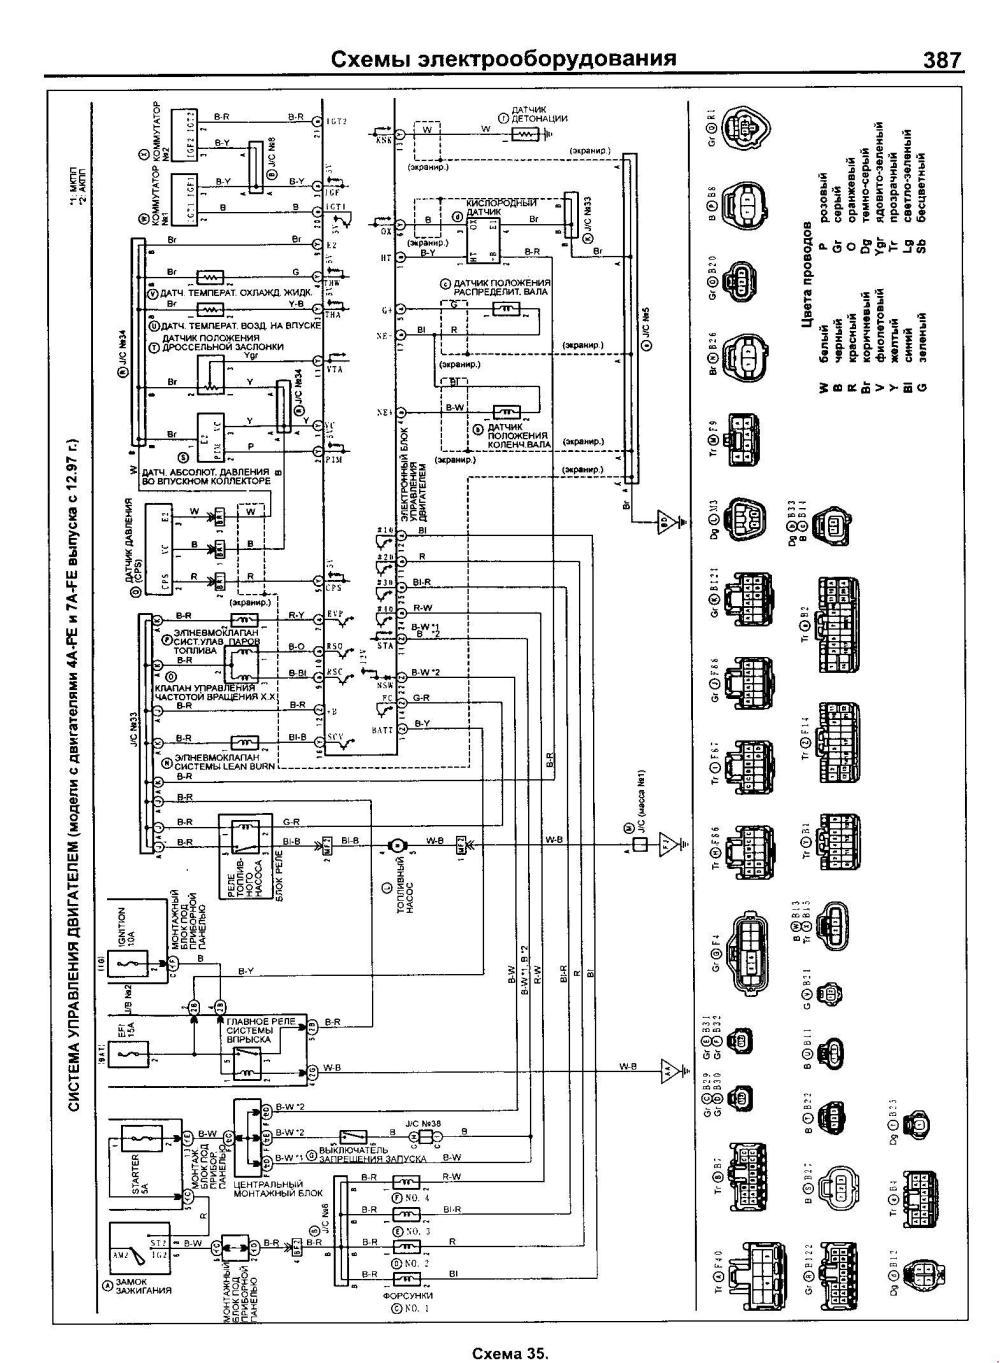 medium resolution of toyota corona service manuals wiring diagrams